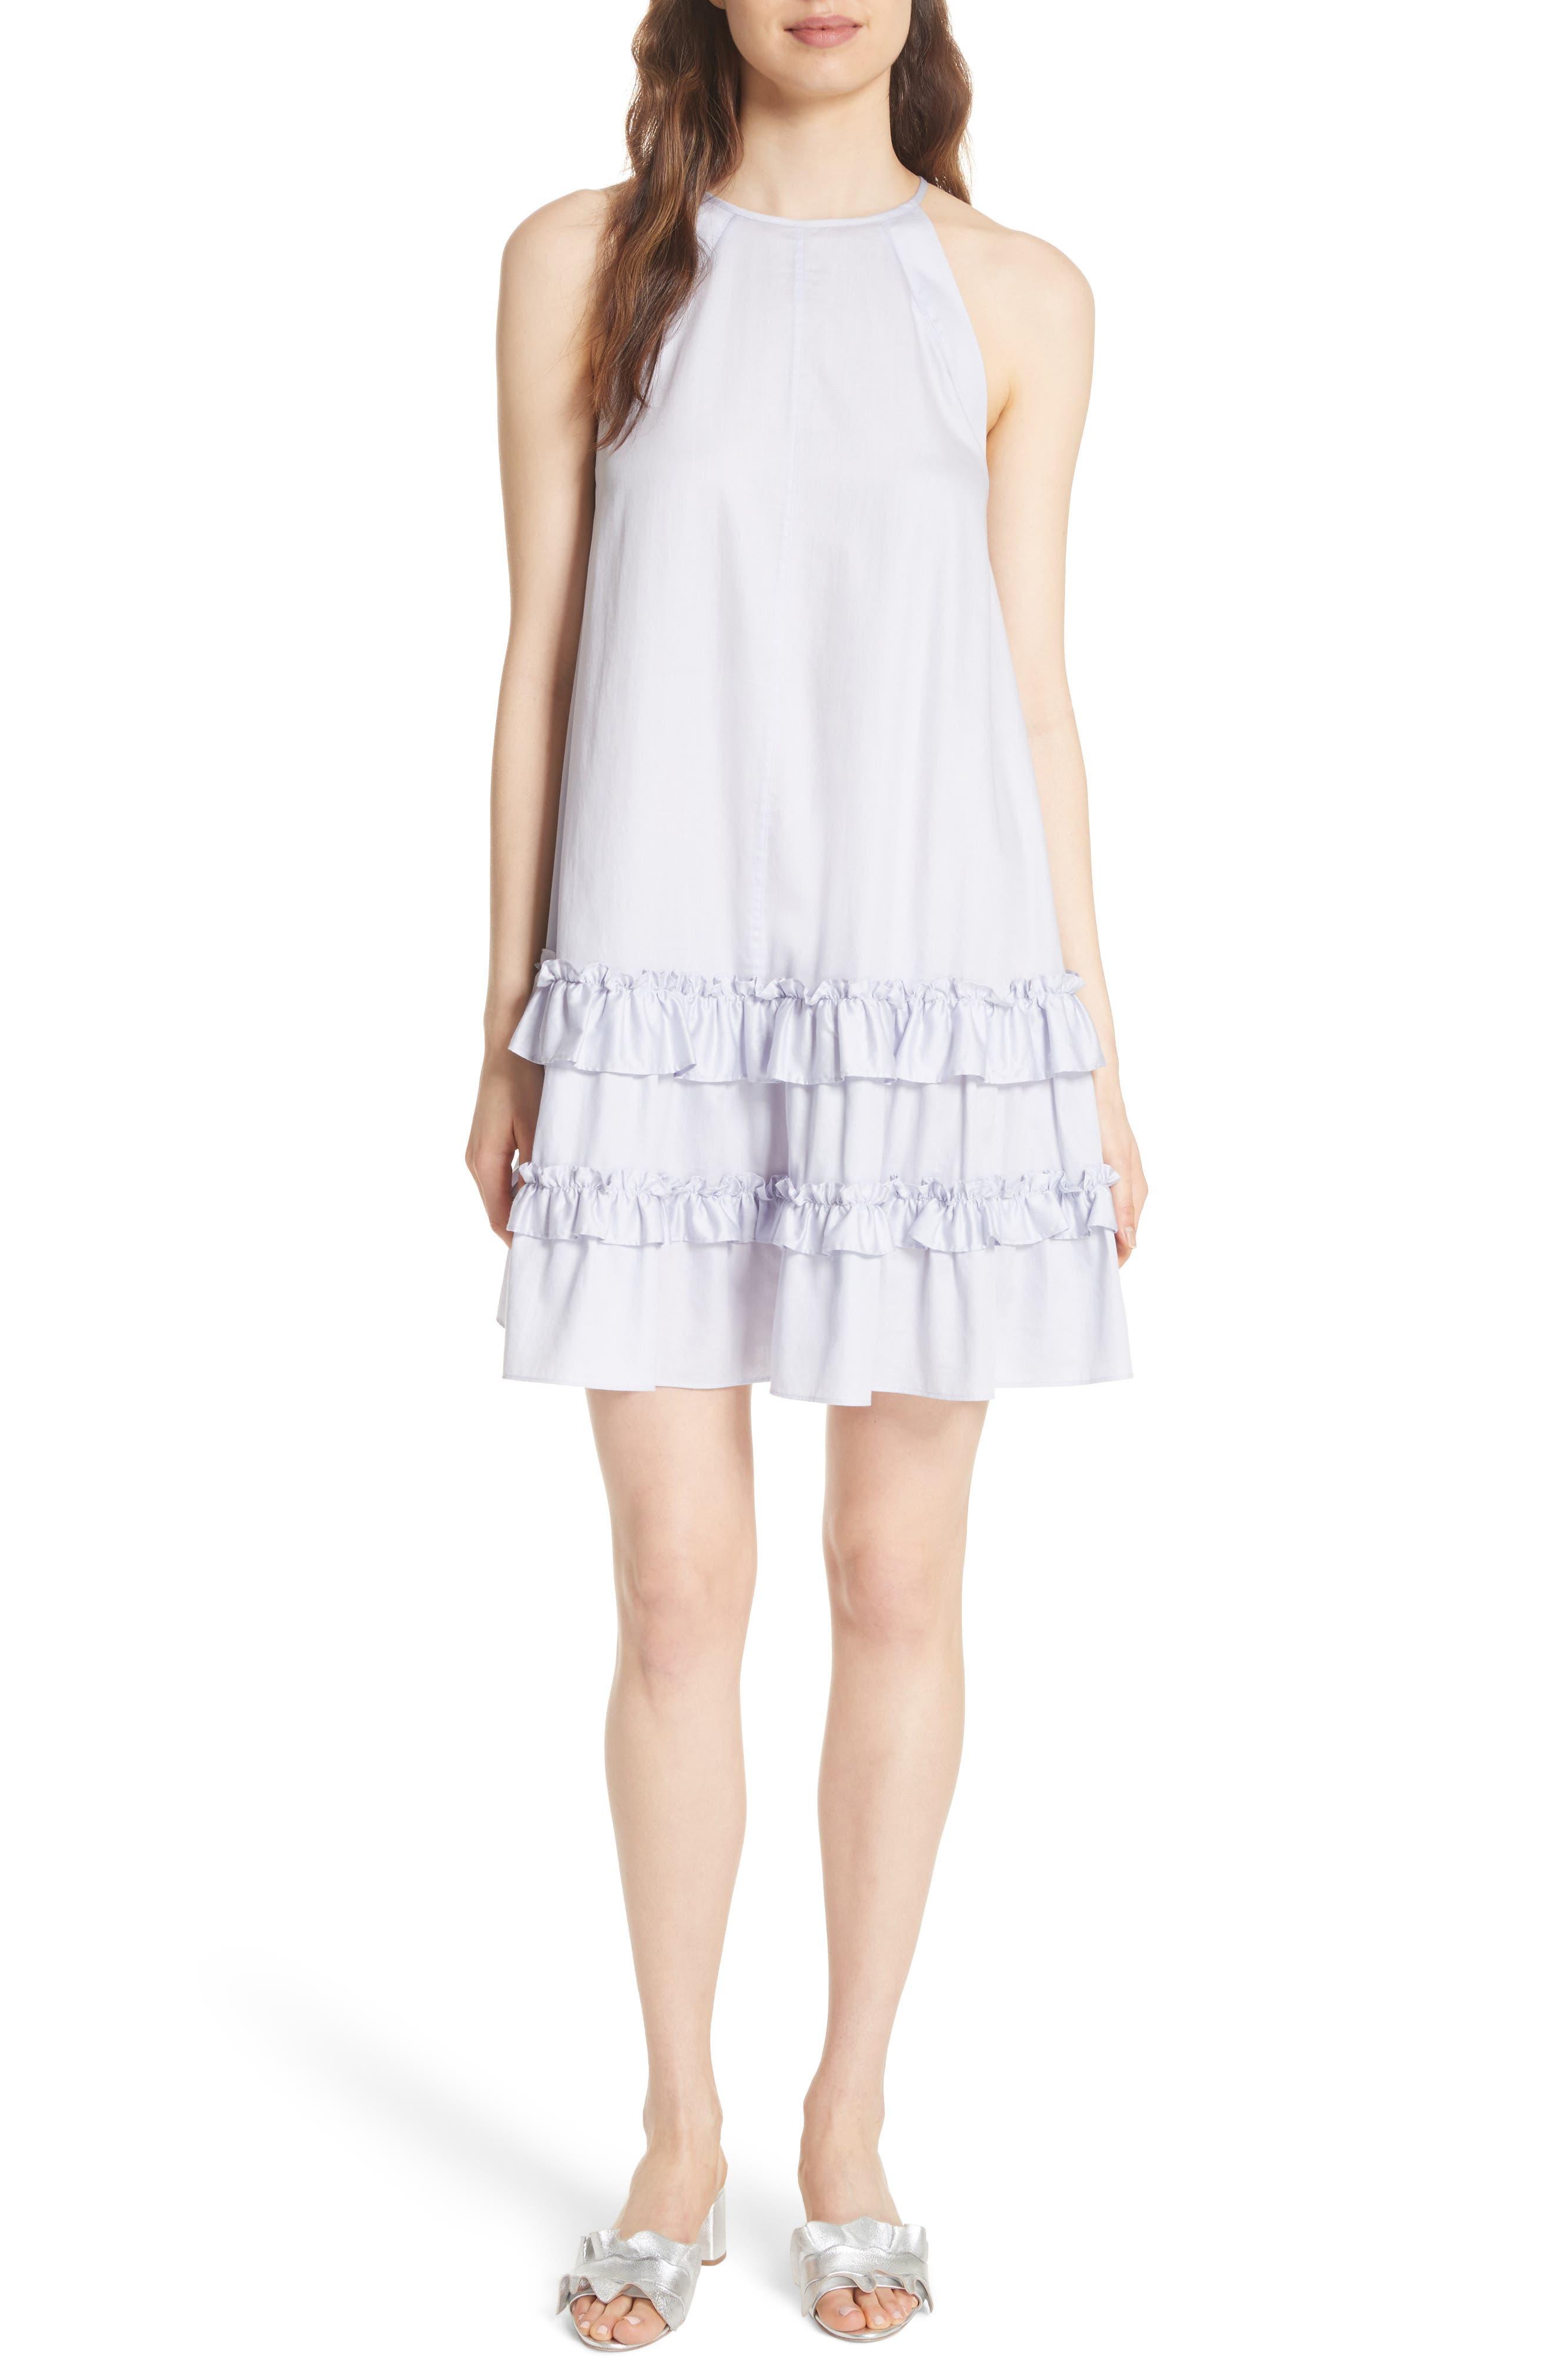 Alternate Image 1 Selected - Rebecca Taylor Sleeveless Cotton Tank Dress